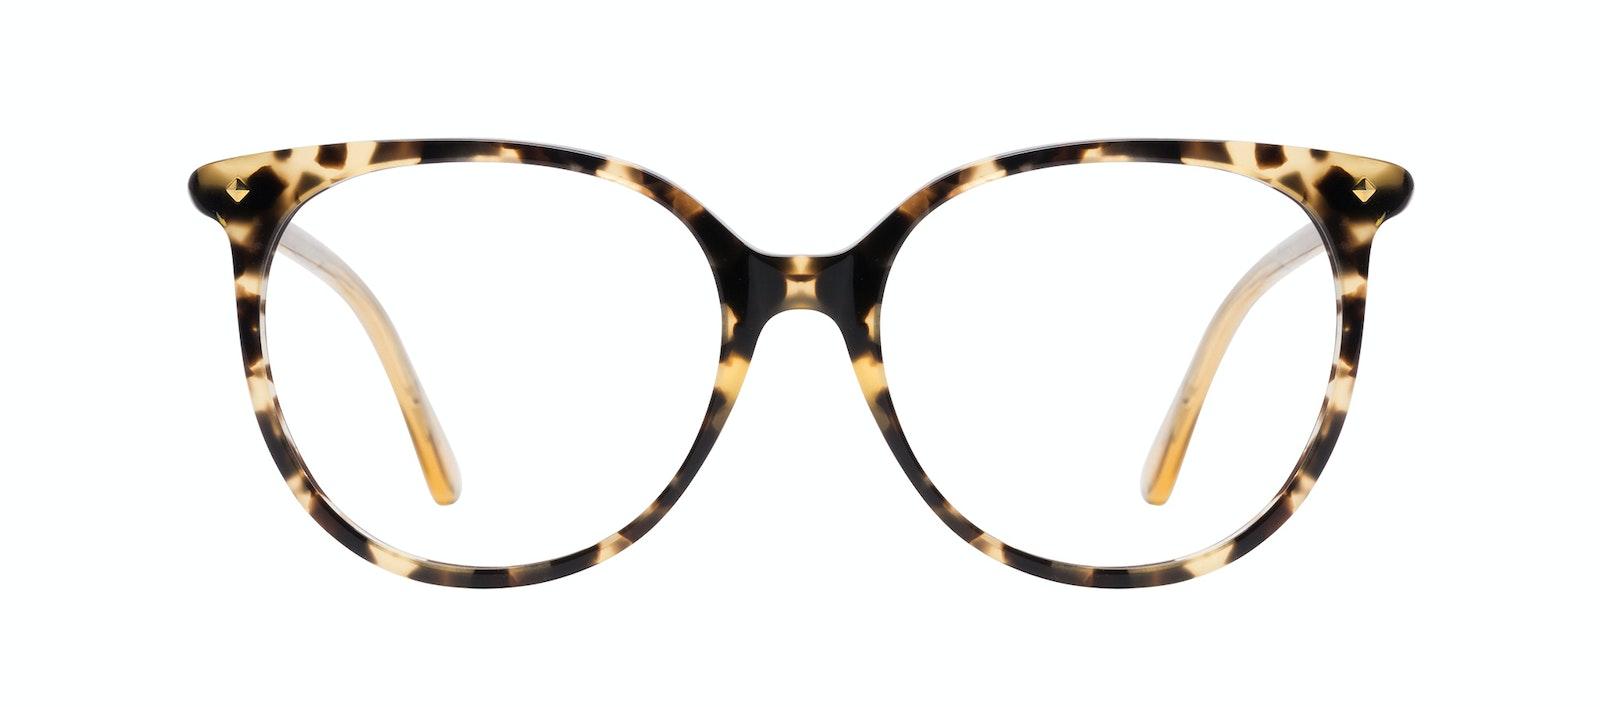 Affordable Fashion Glasses Round Eyeglasses Women Area Petite Bingal Front